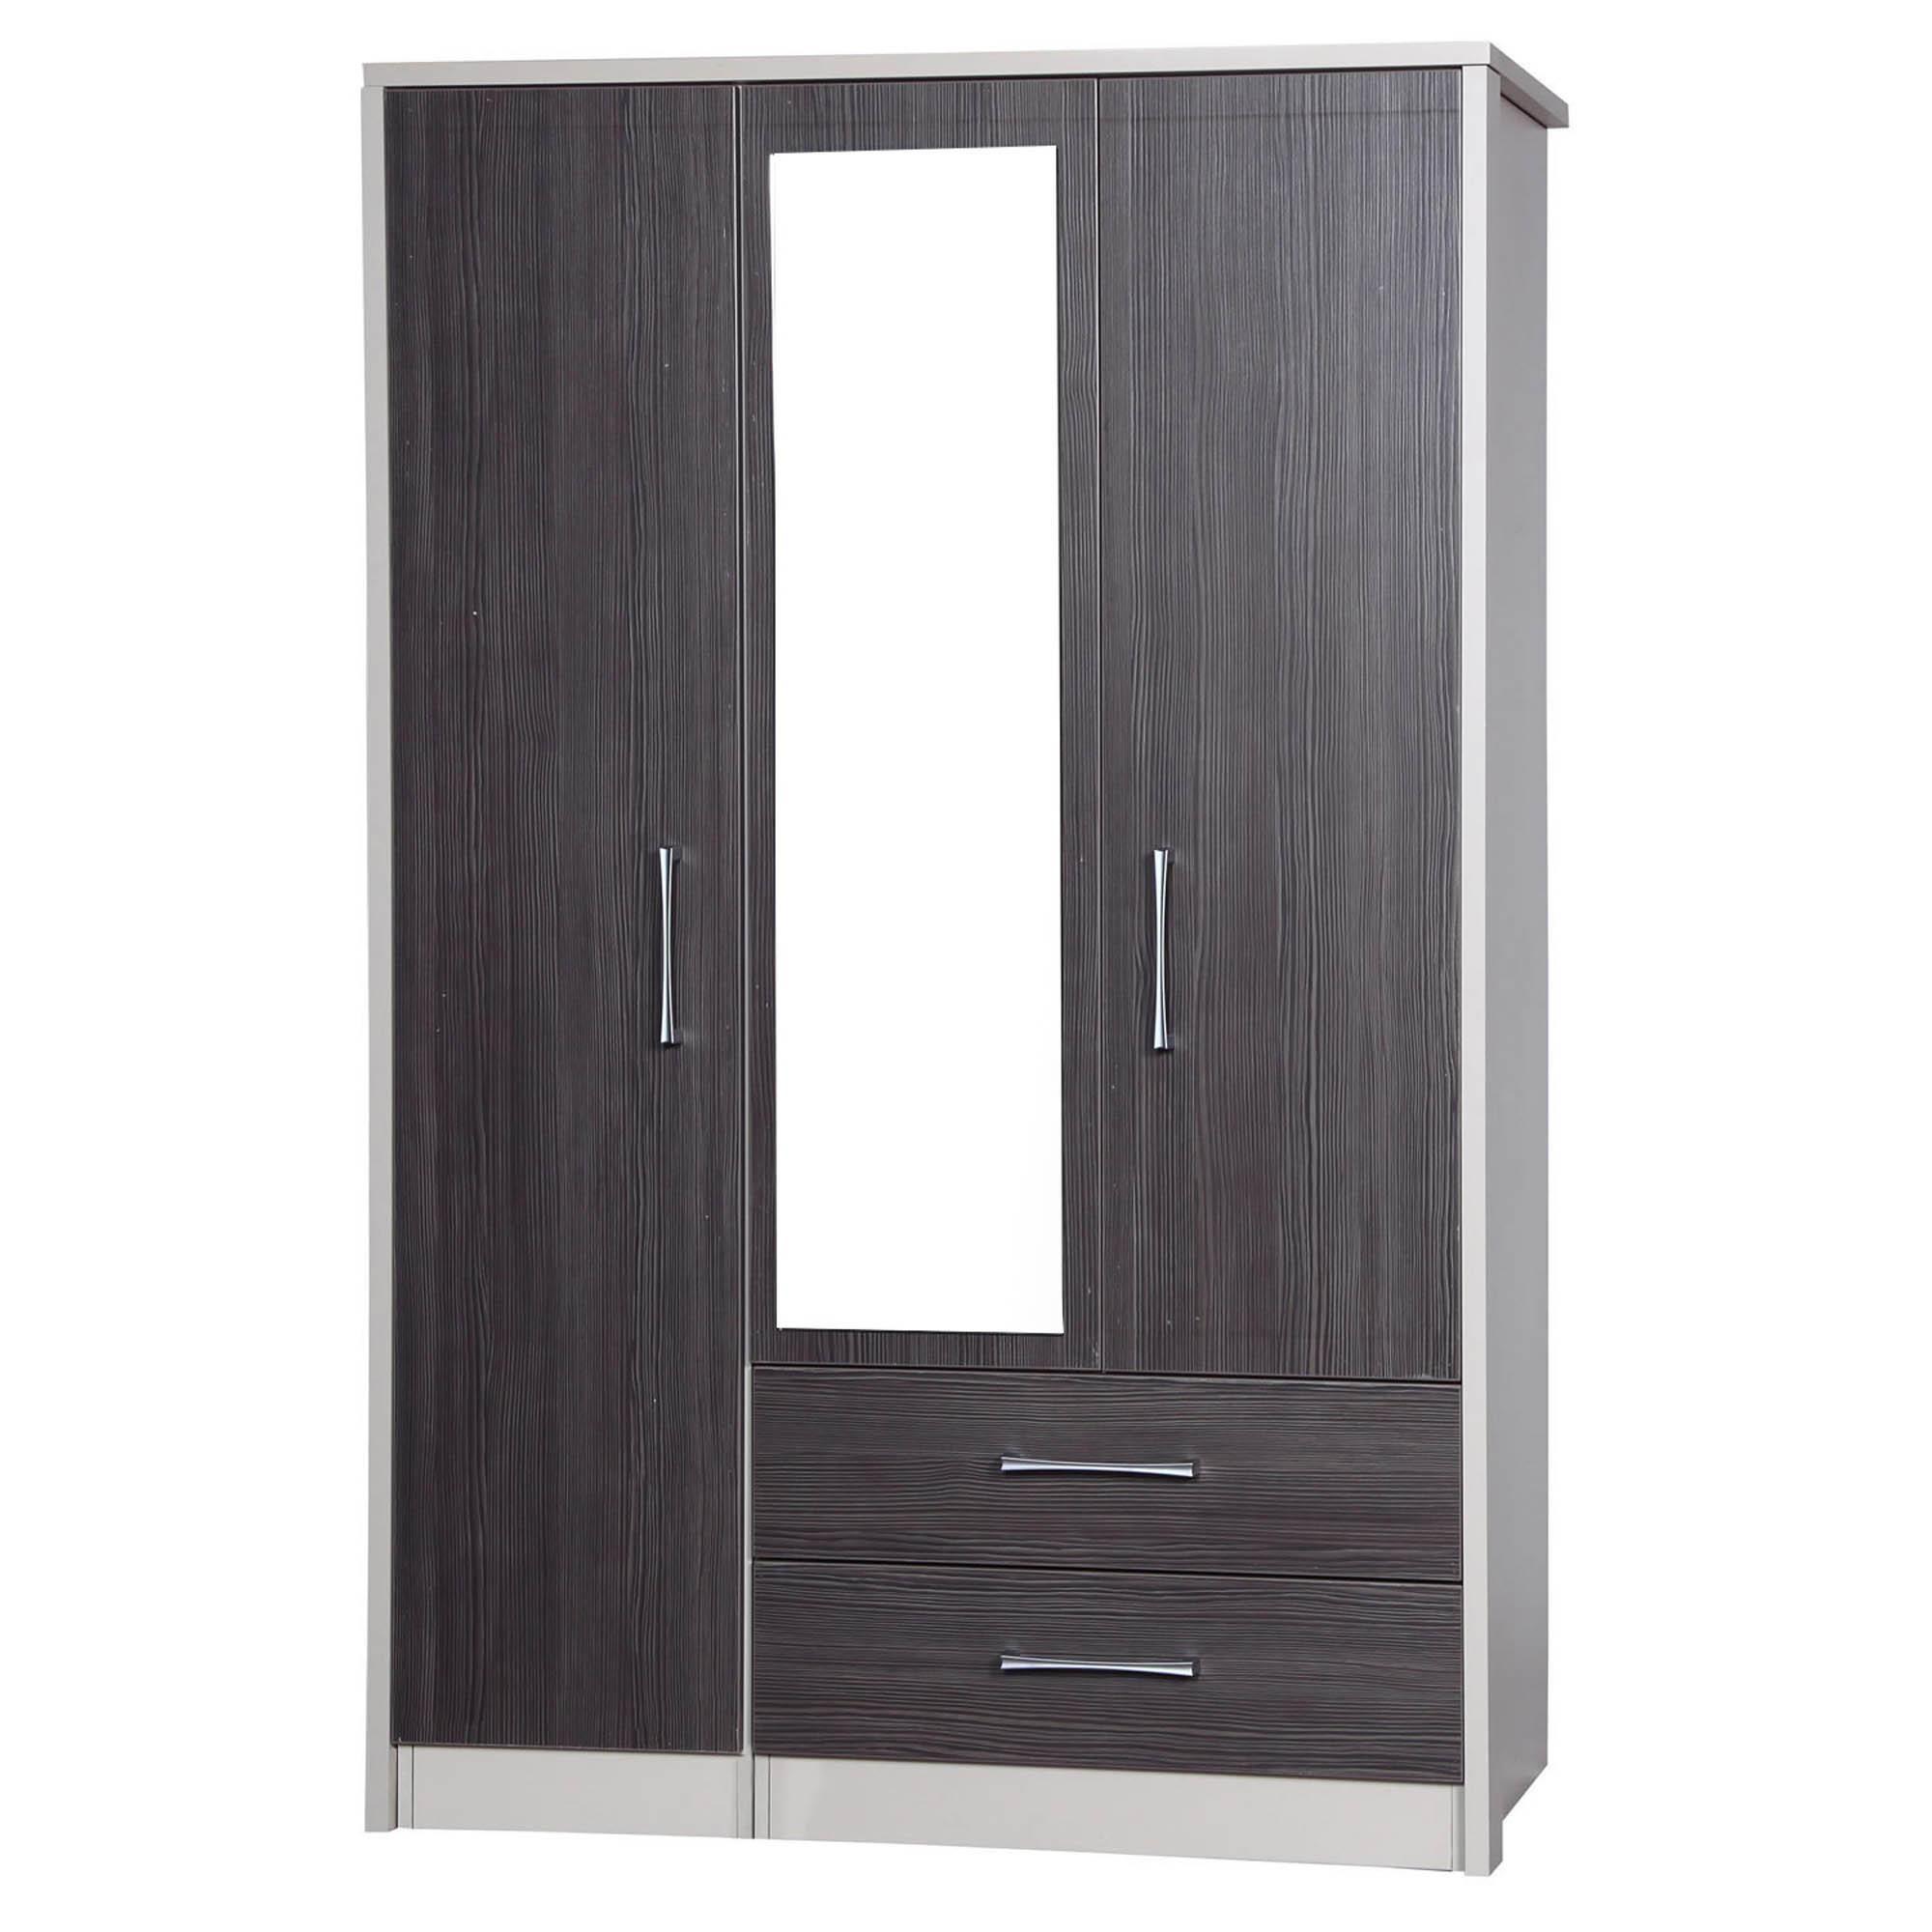 Avola Grey 3 Door 2 Drawer Combi Wardrobe With Mirror Mirrored Wardrobe Oak Wardrobe Tall Cabinet Storage